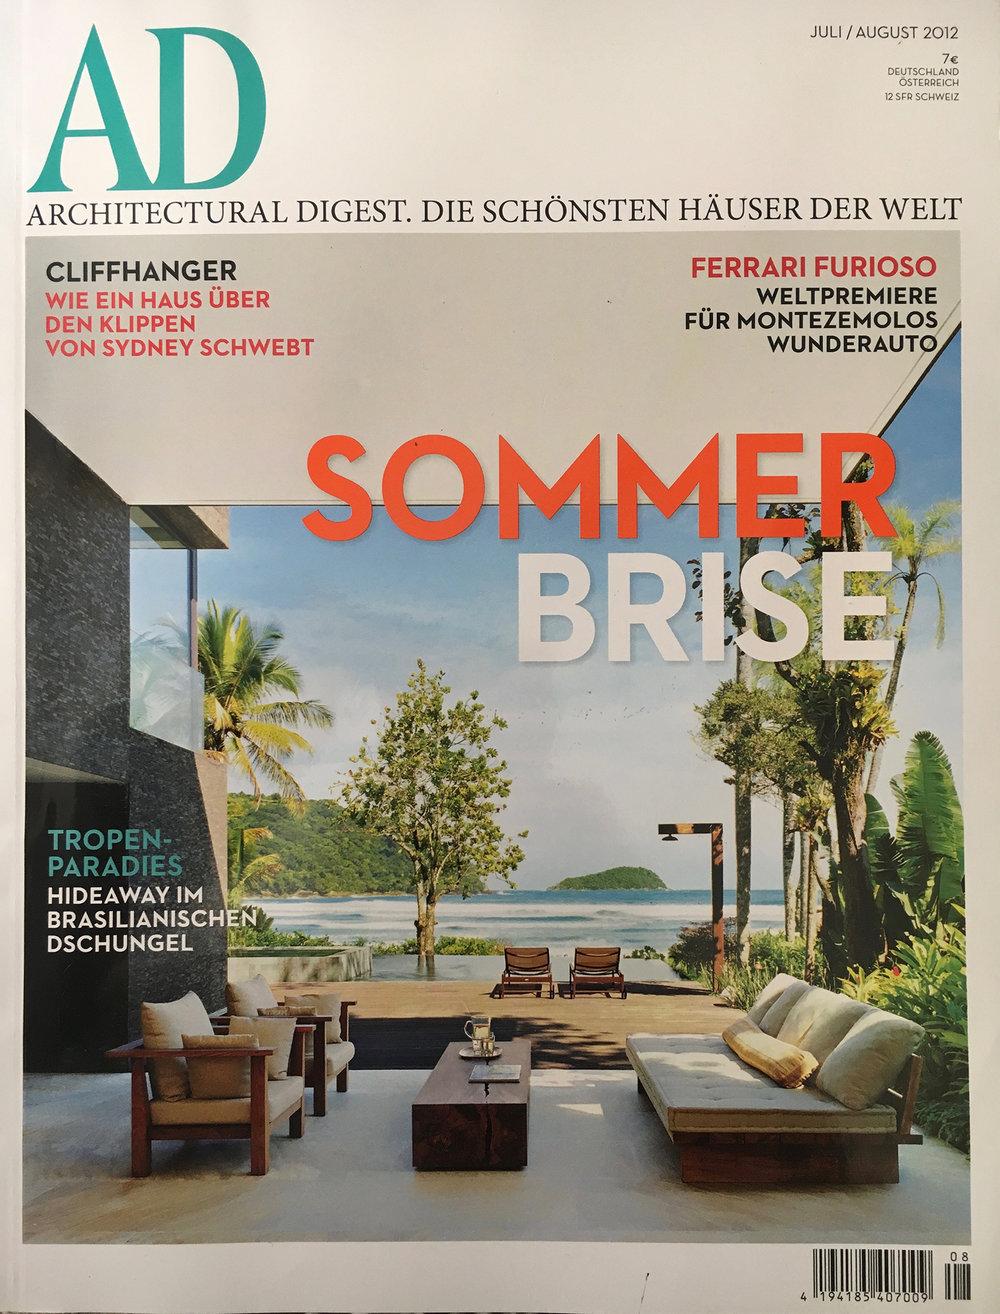 >> Architectural Digest 2012